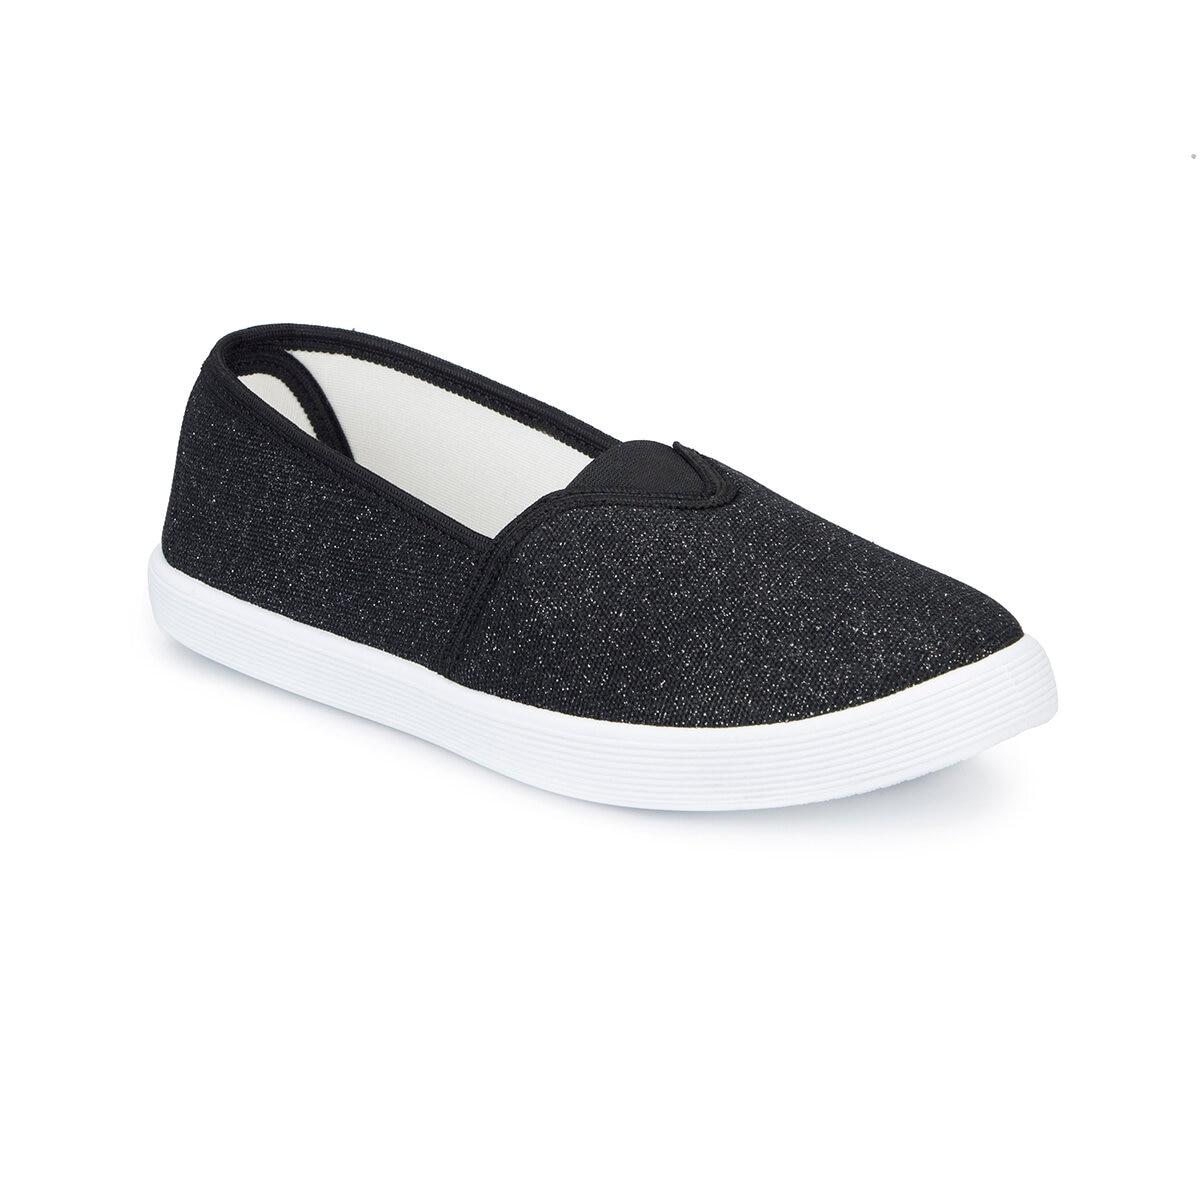 FLO 81. 311594.Z Black Women Shoes Polaris